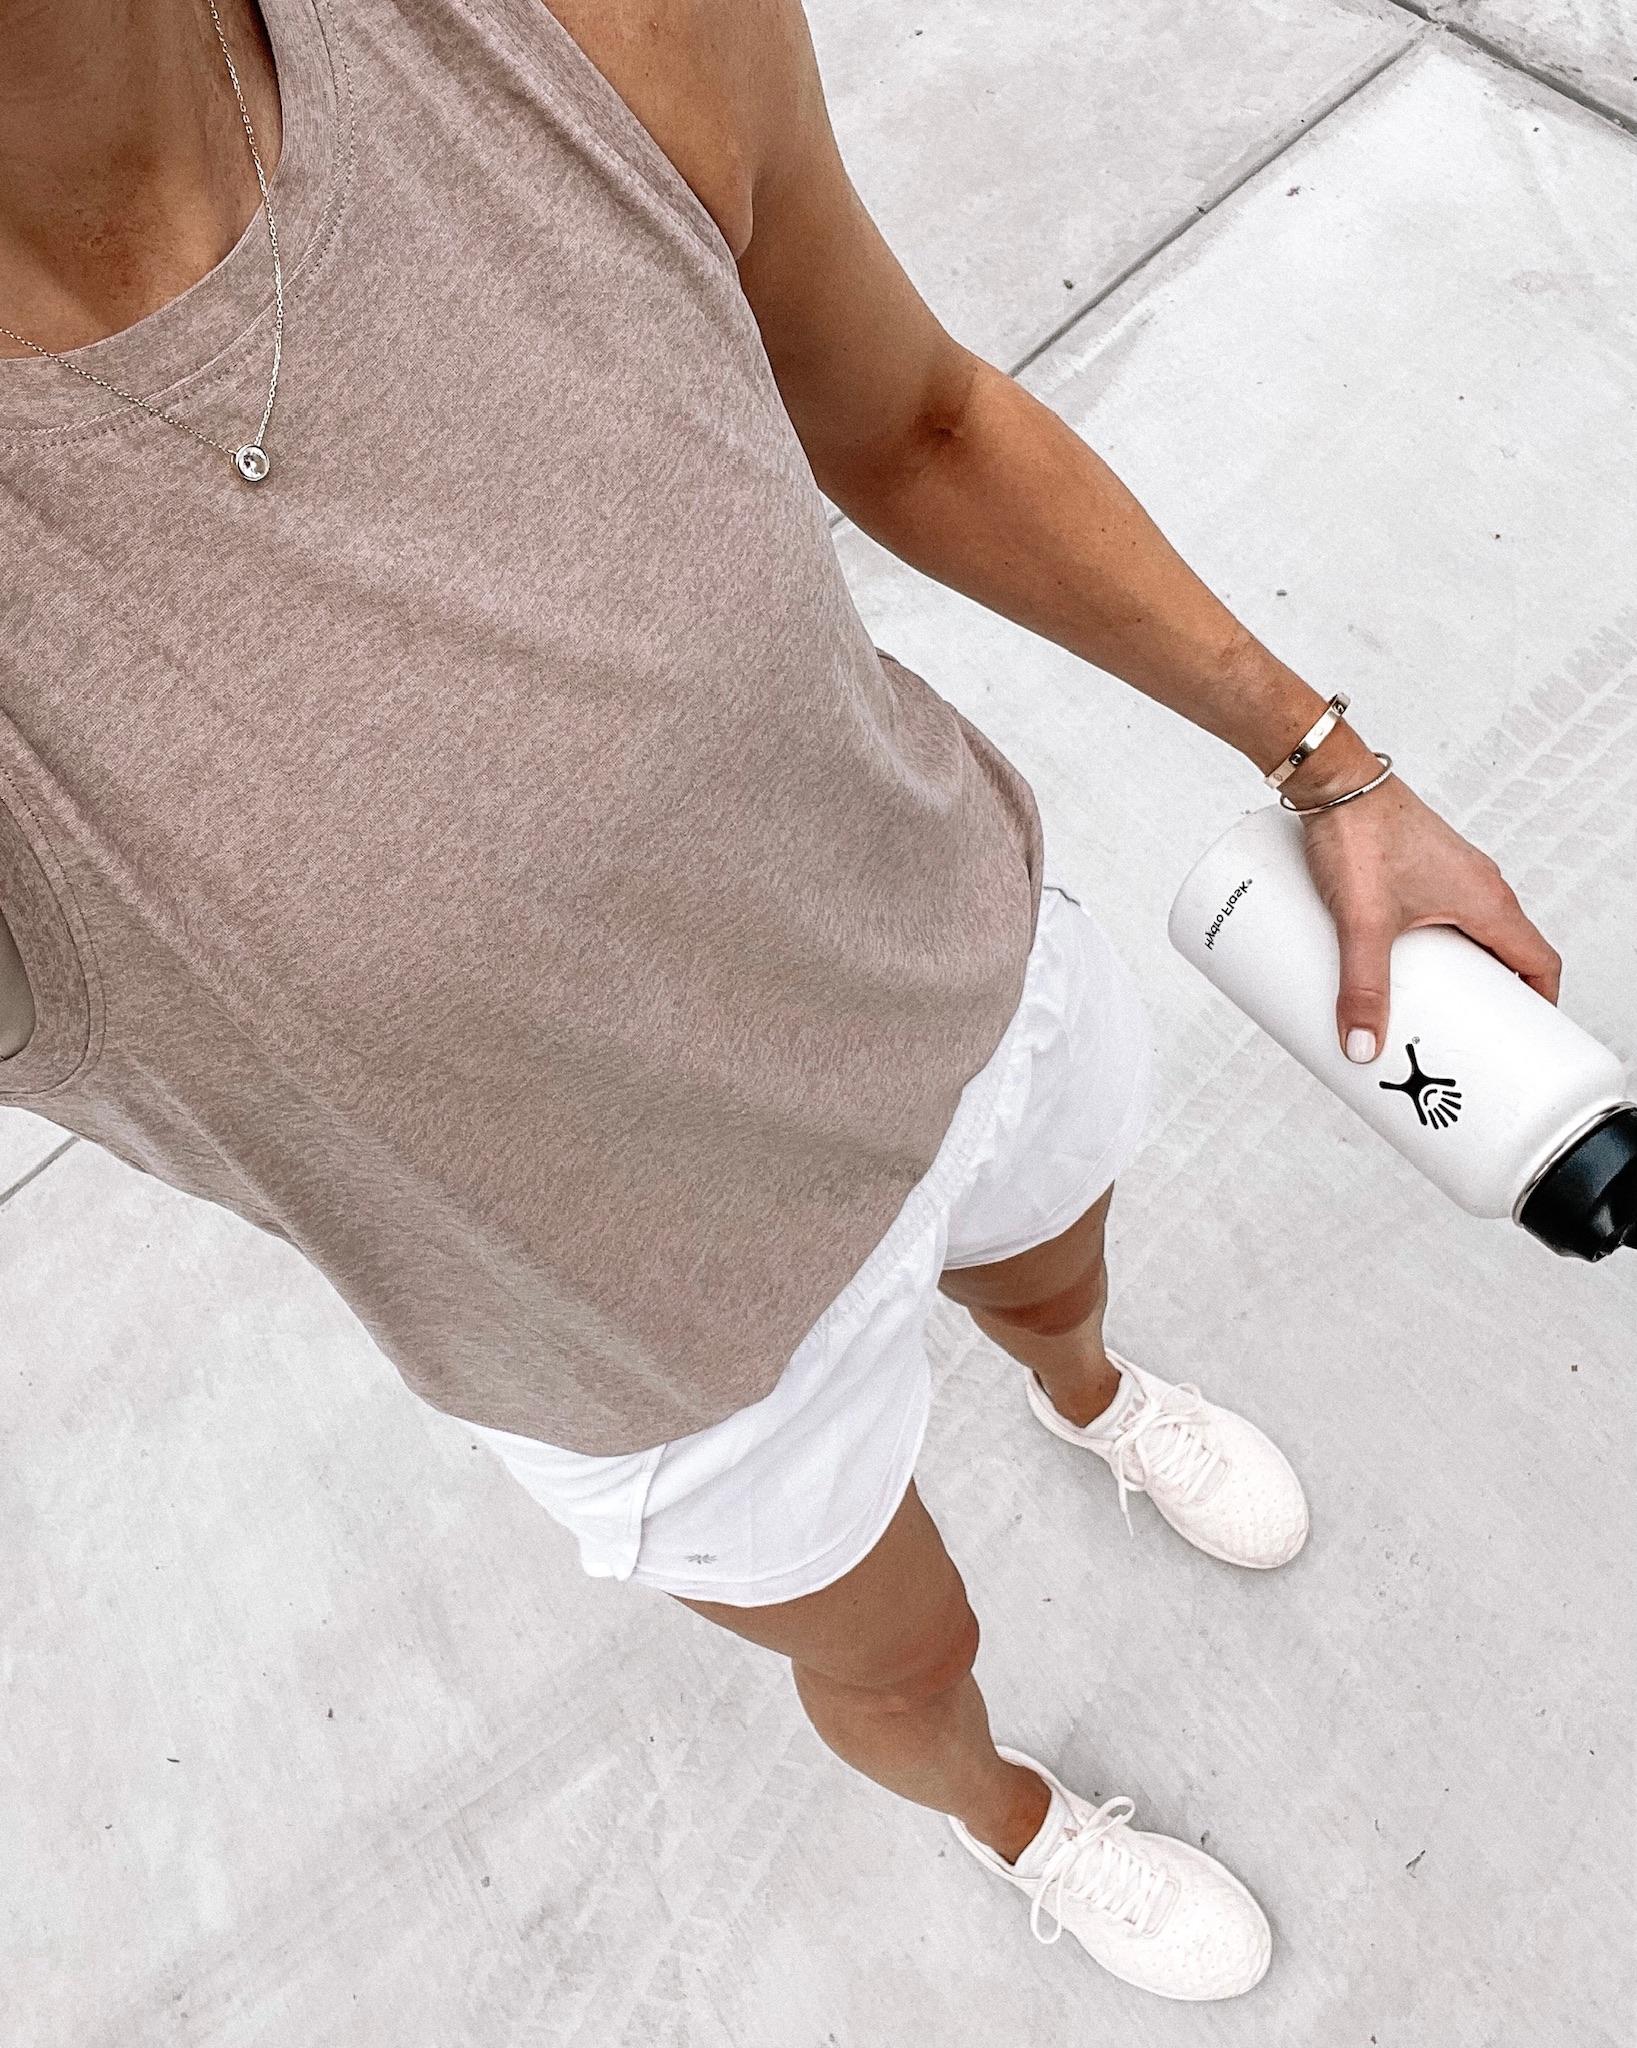 Fashion Jackson Wearing Beyond Yoga Beige Tank Athleta White Running Shorts APL Sneakers workout outfits for women